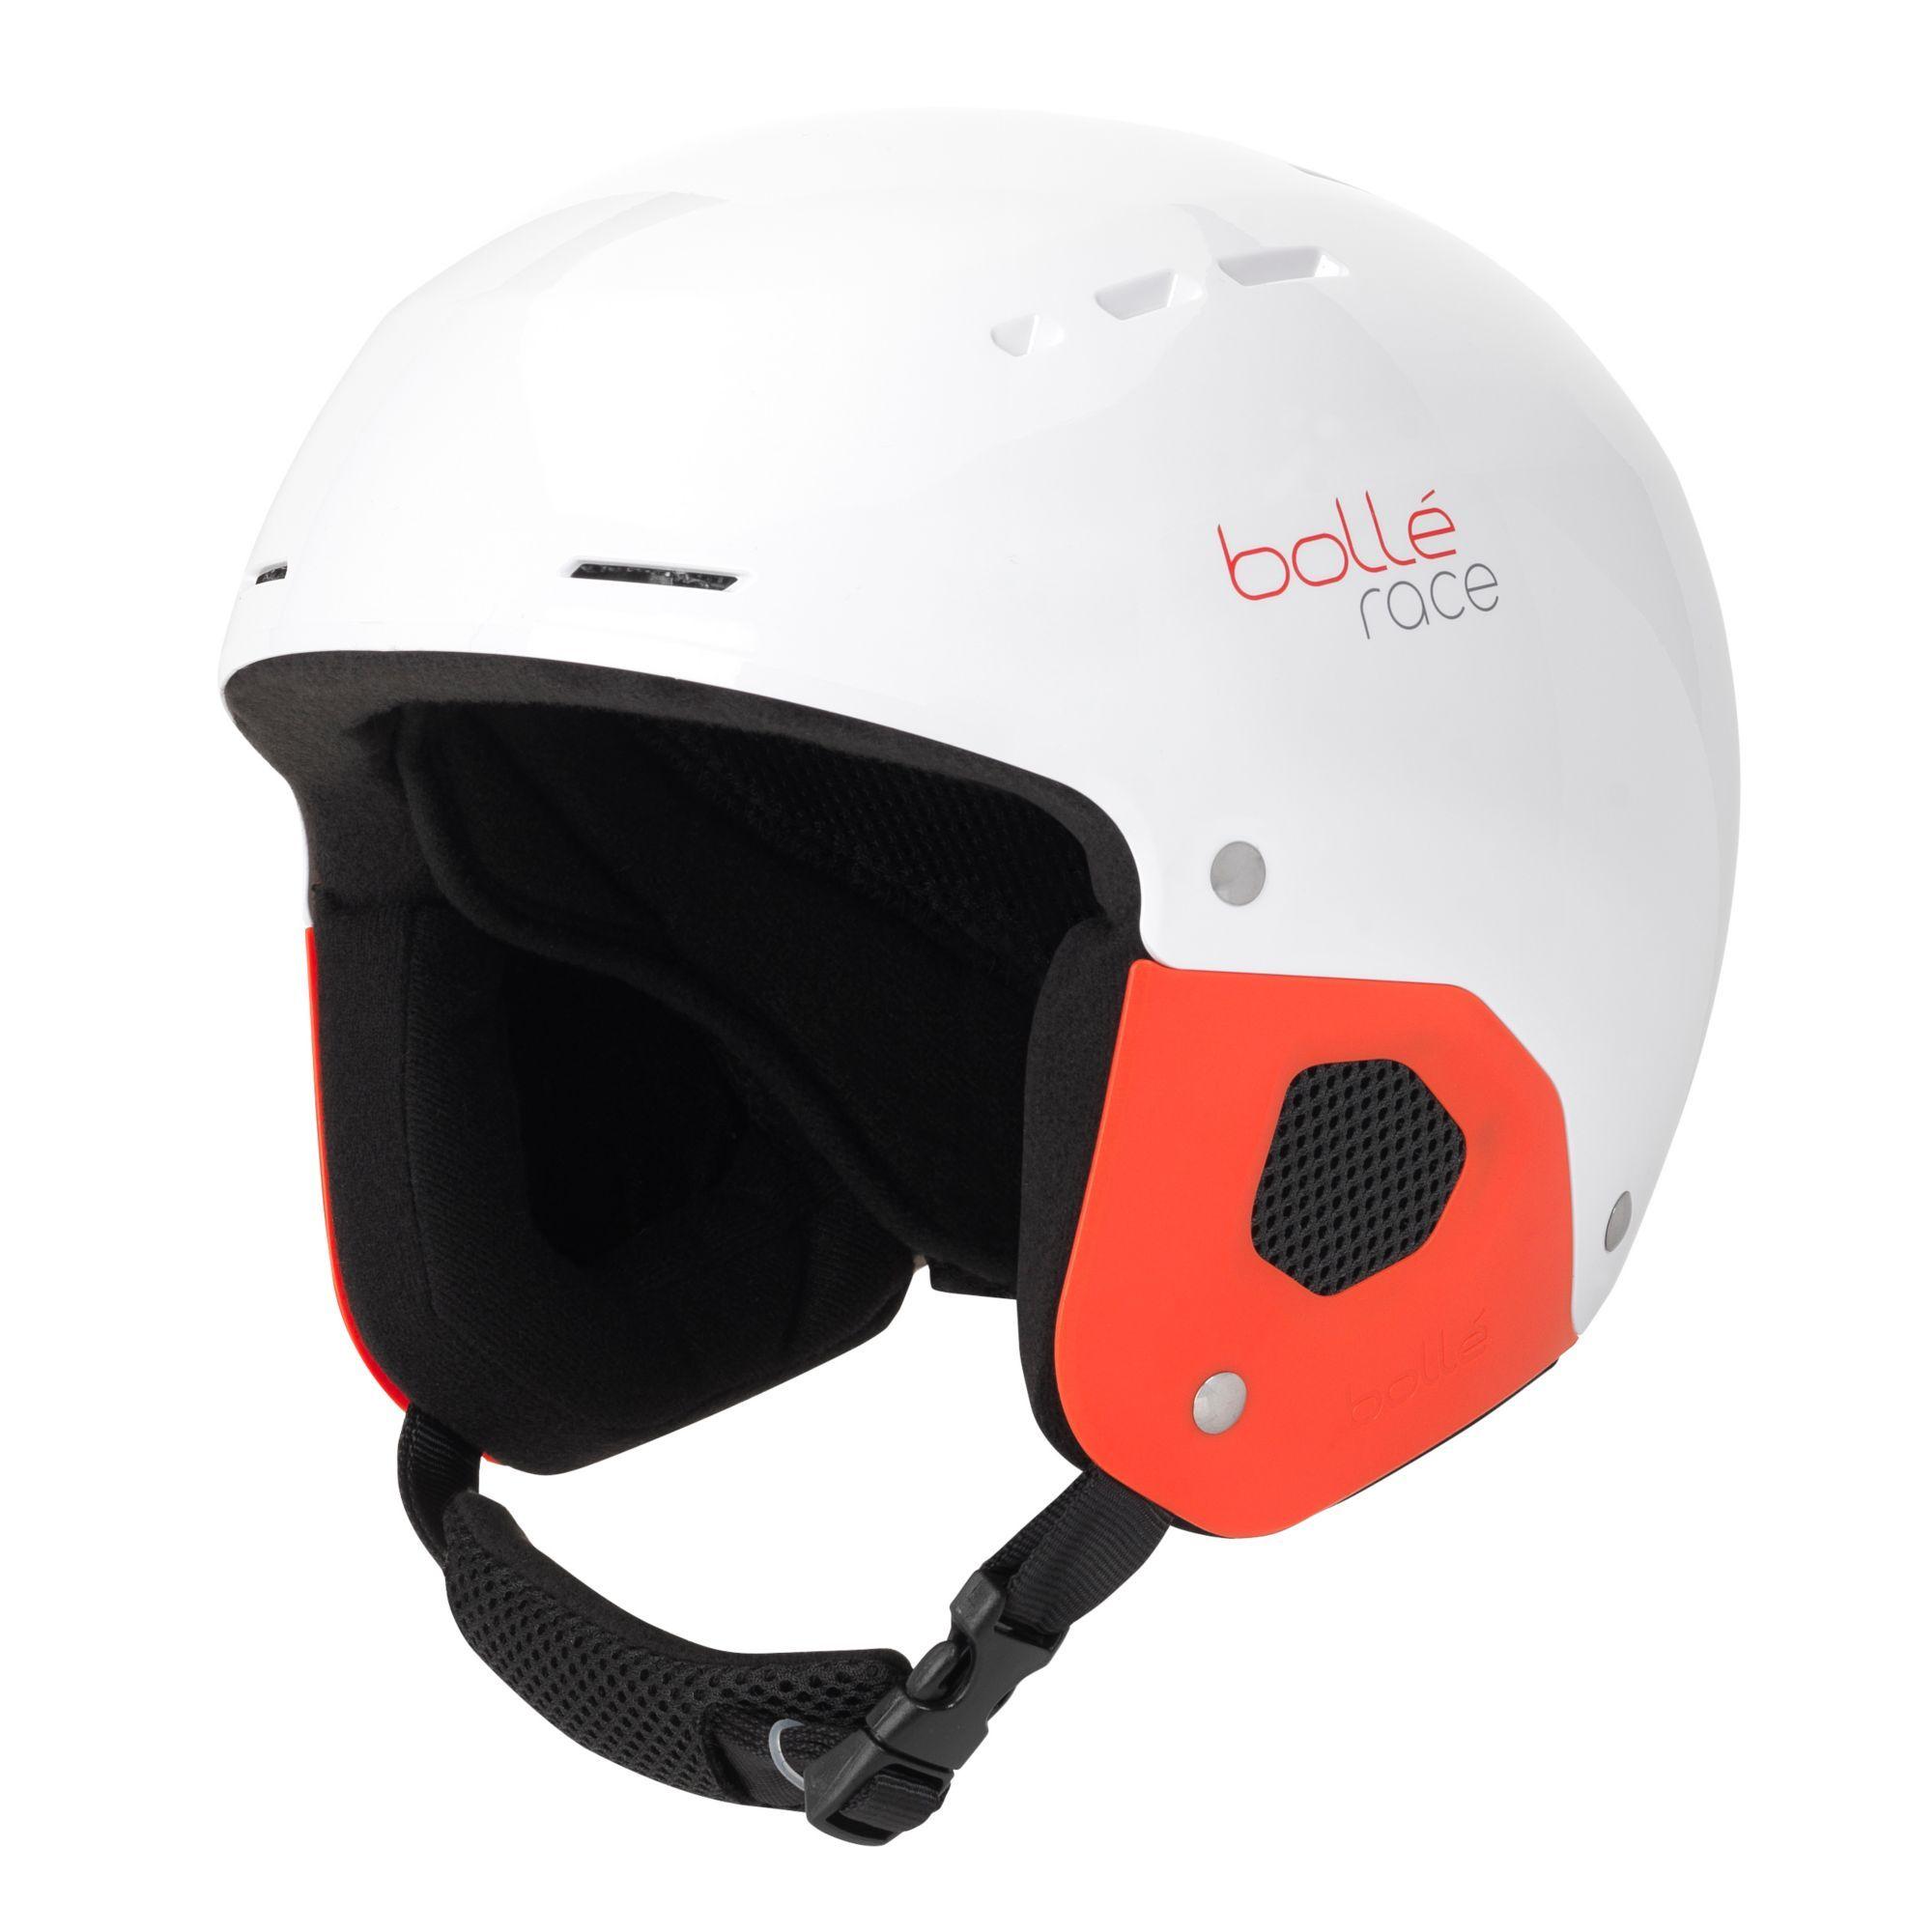 Bolle Riding Helmet XSmall Size